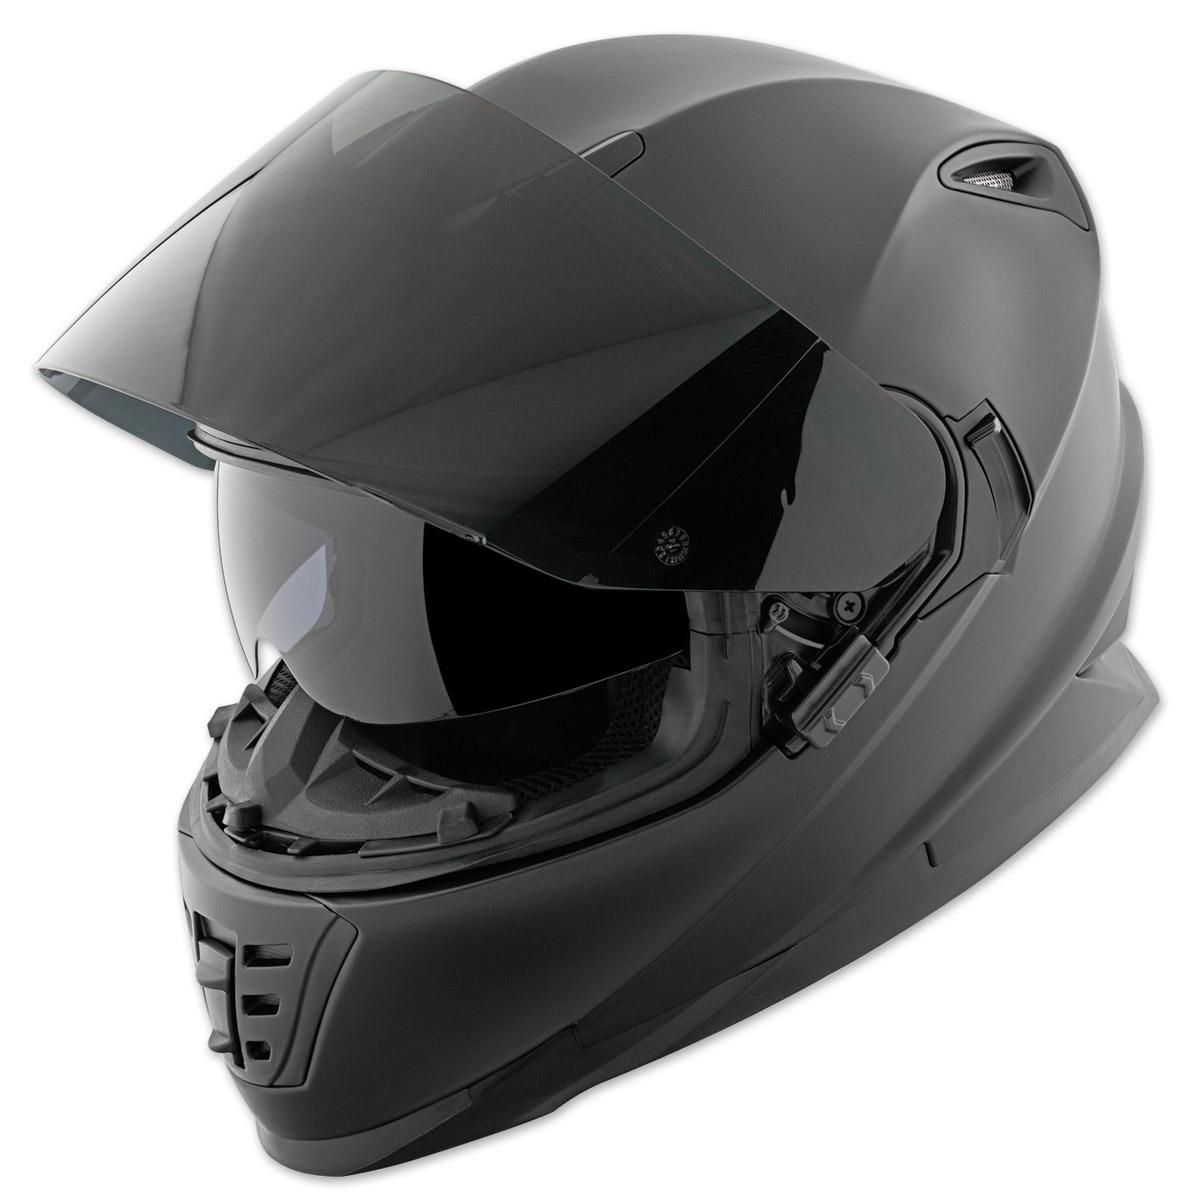 Full Motorcycle Helmet >> Speed And Strength Ss1600 Solid Matte Black Full Face Helmet 212